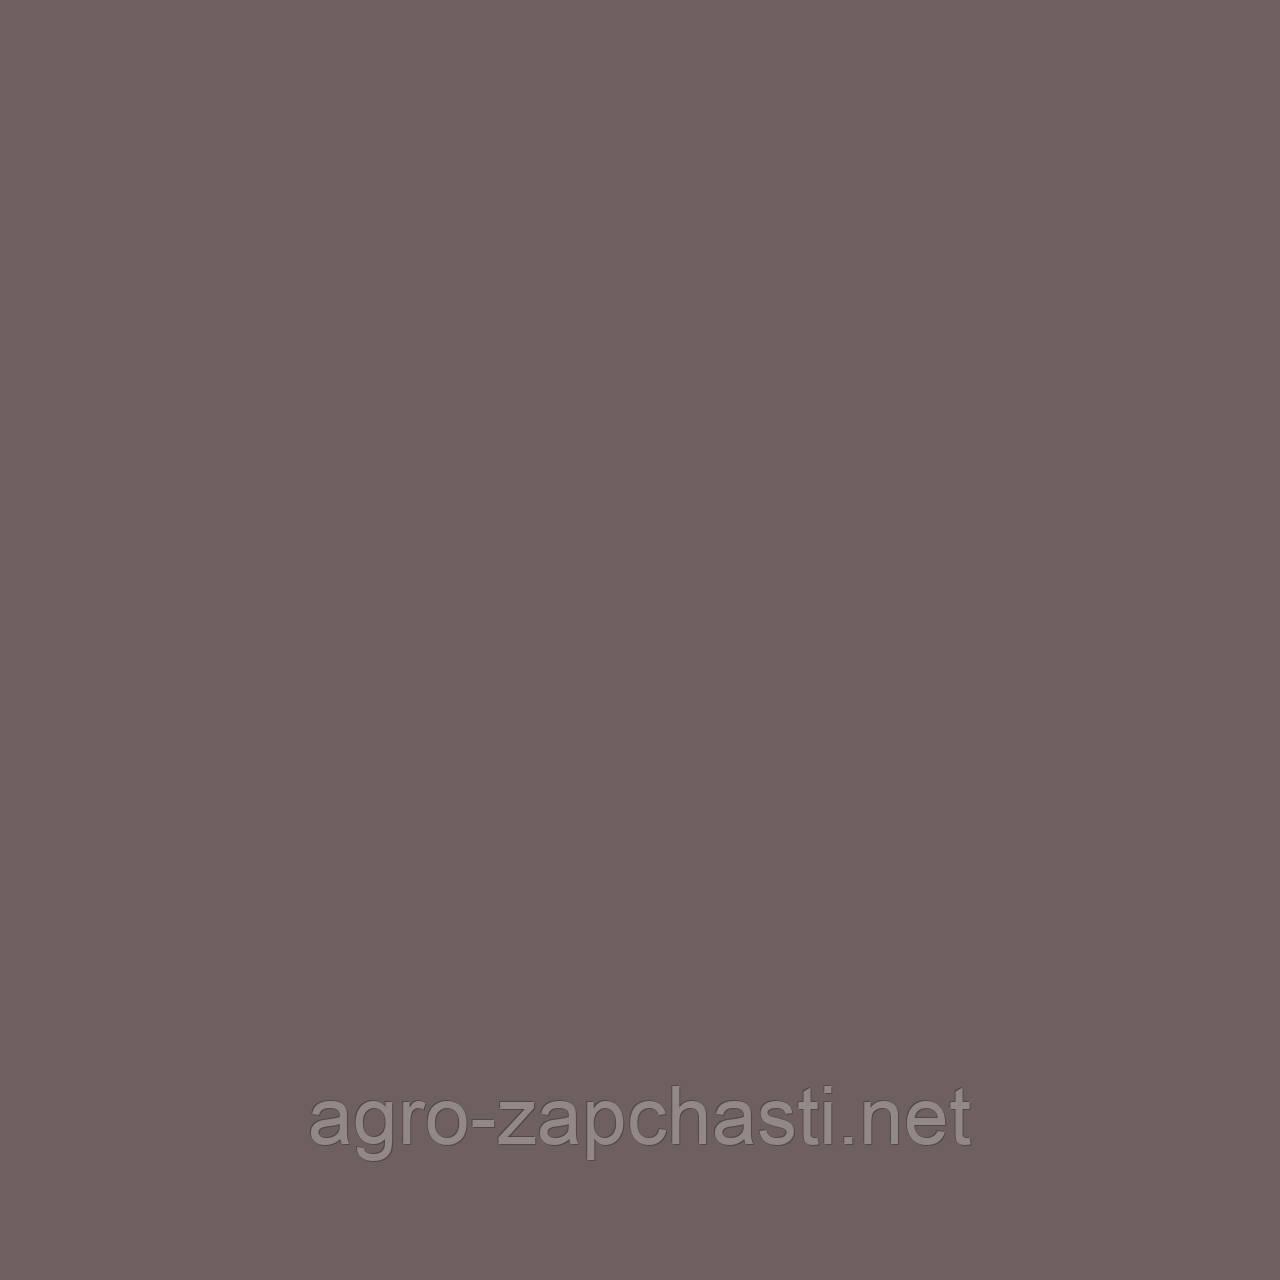 Фарба Erbedol Massey Ferguson сіра метал 0,75 l